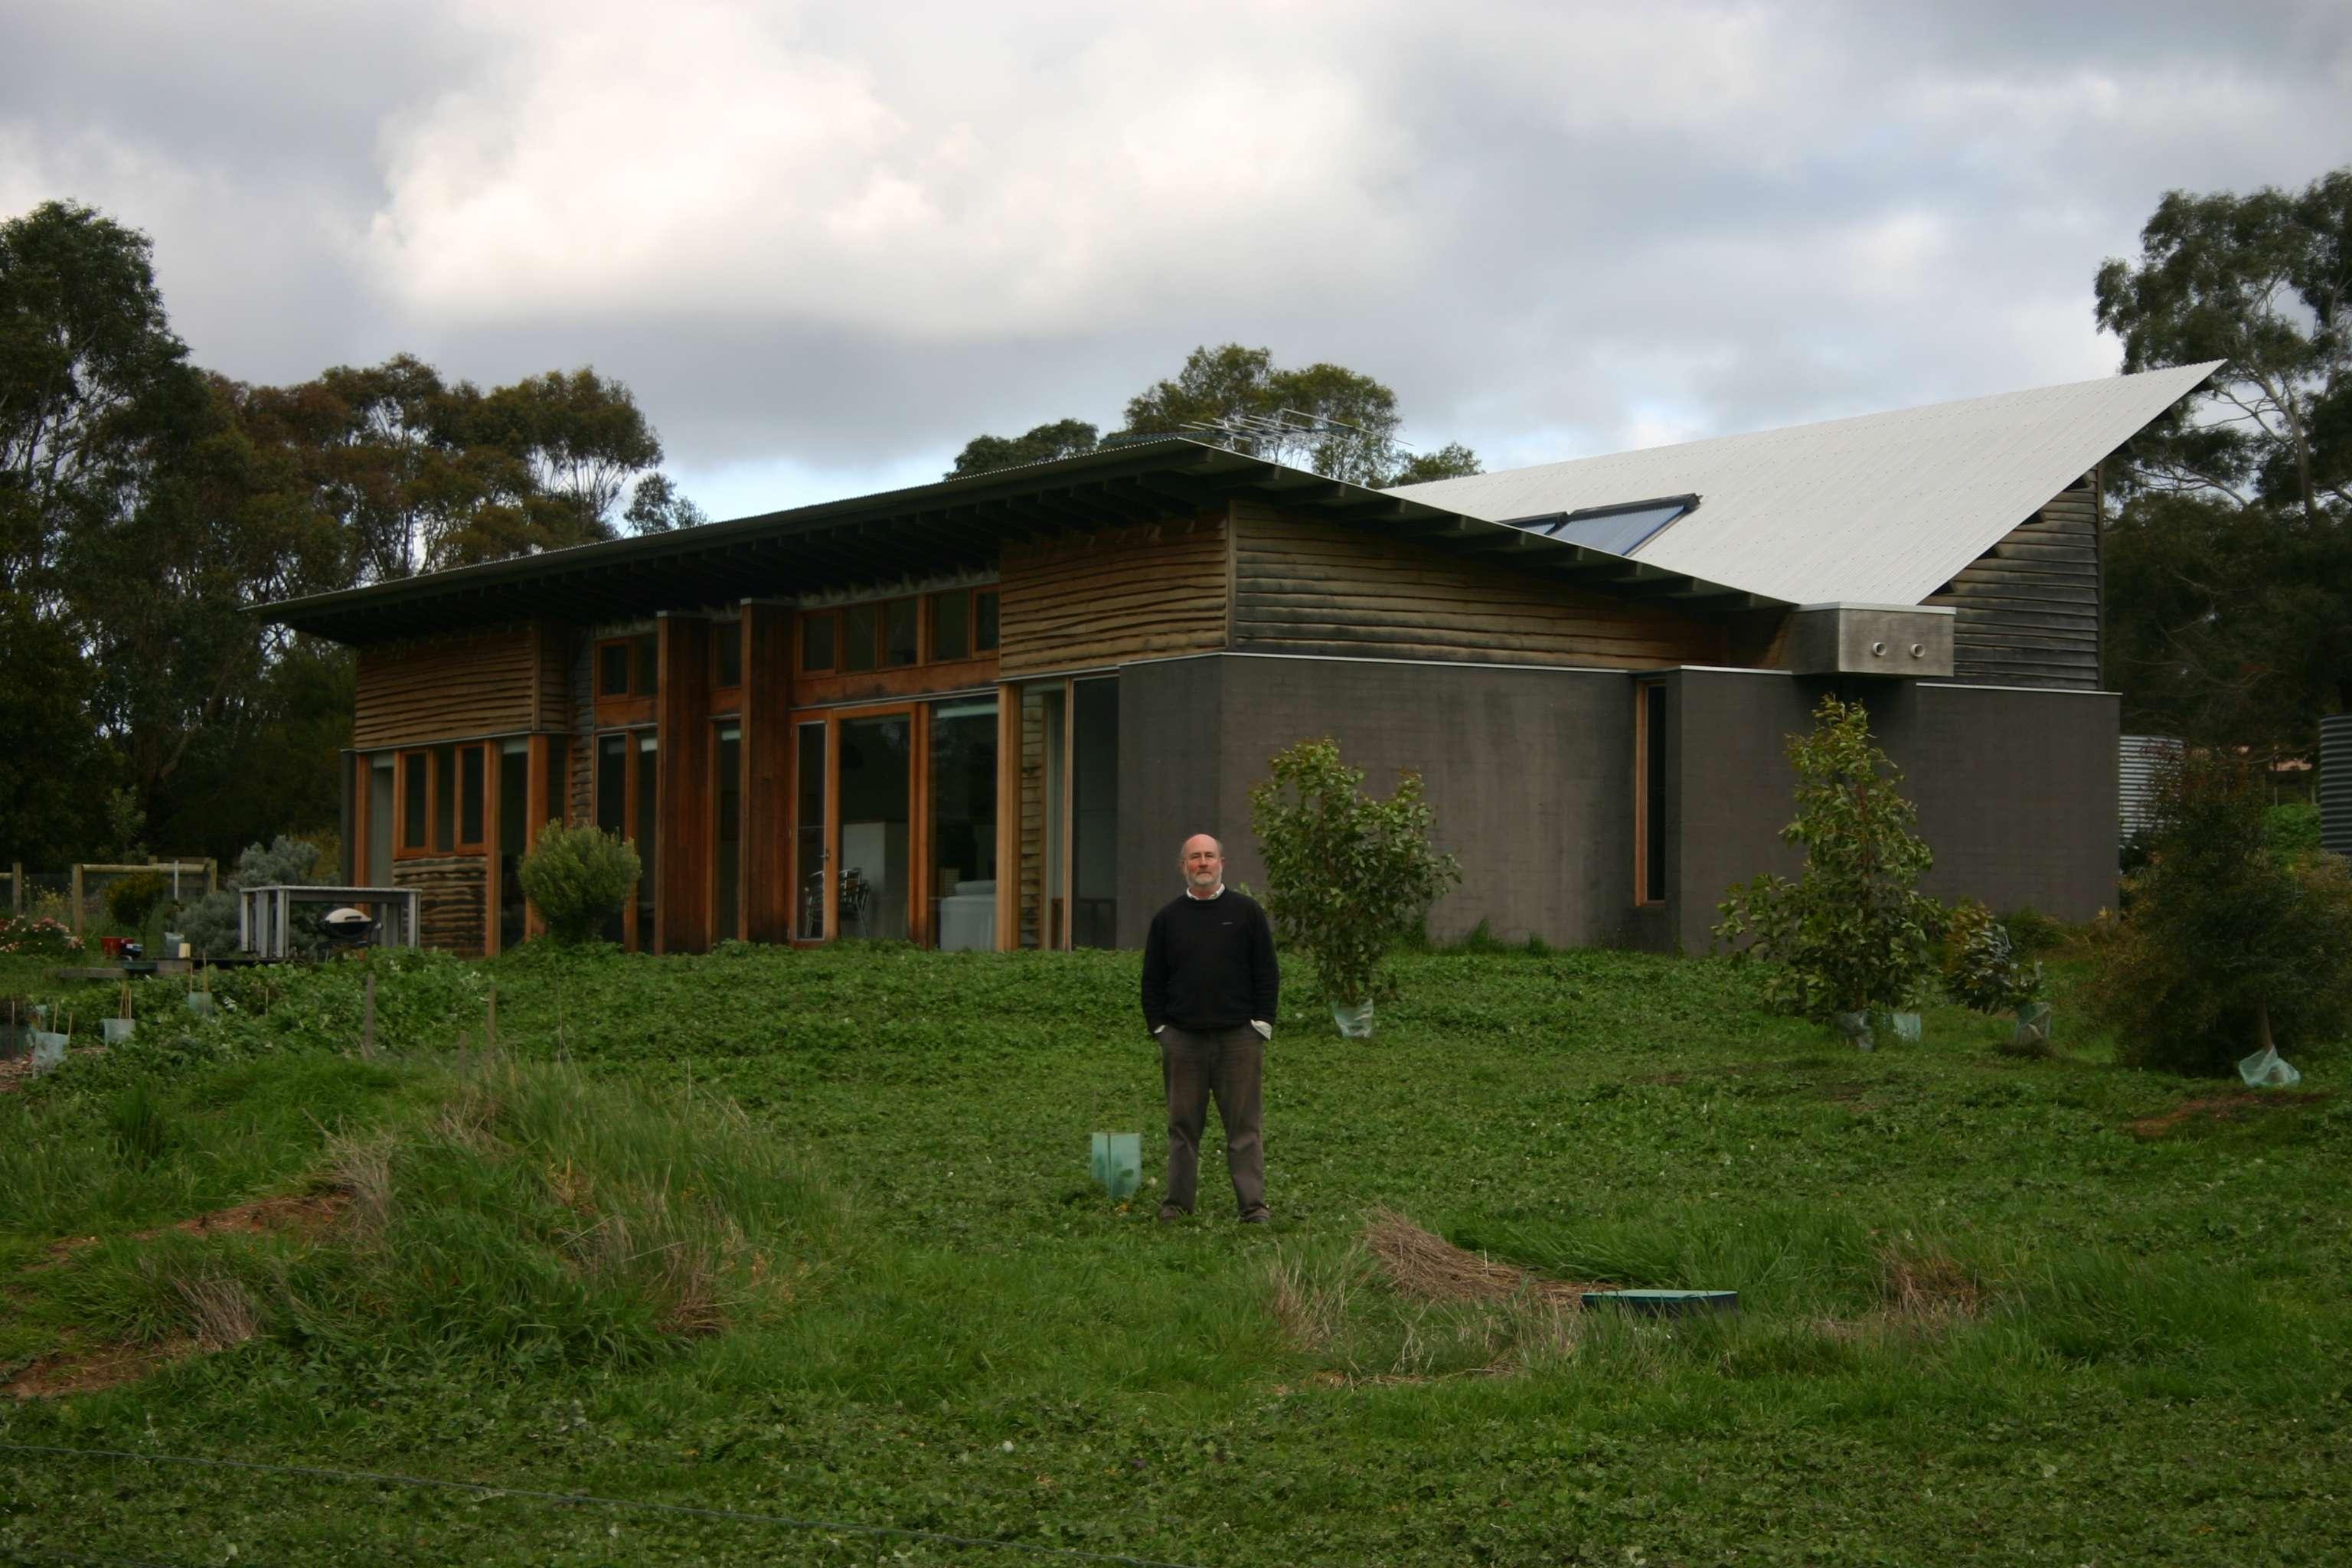 Alternative Energy Sustainable House Design Utility Bills Farm